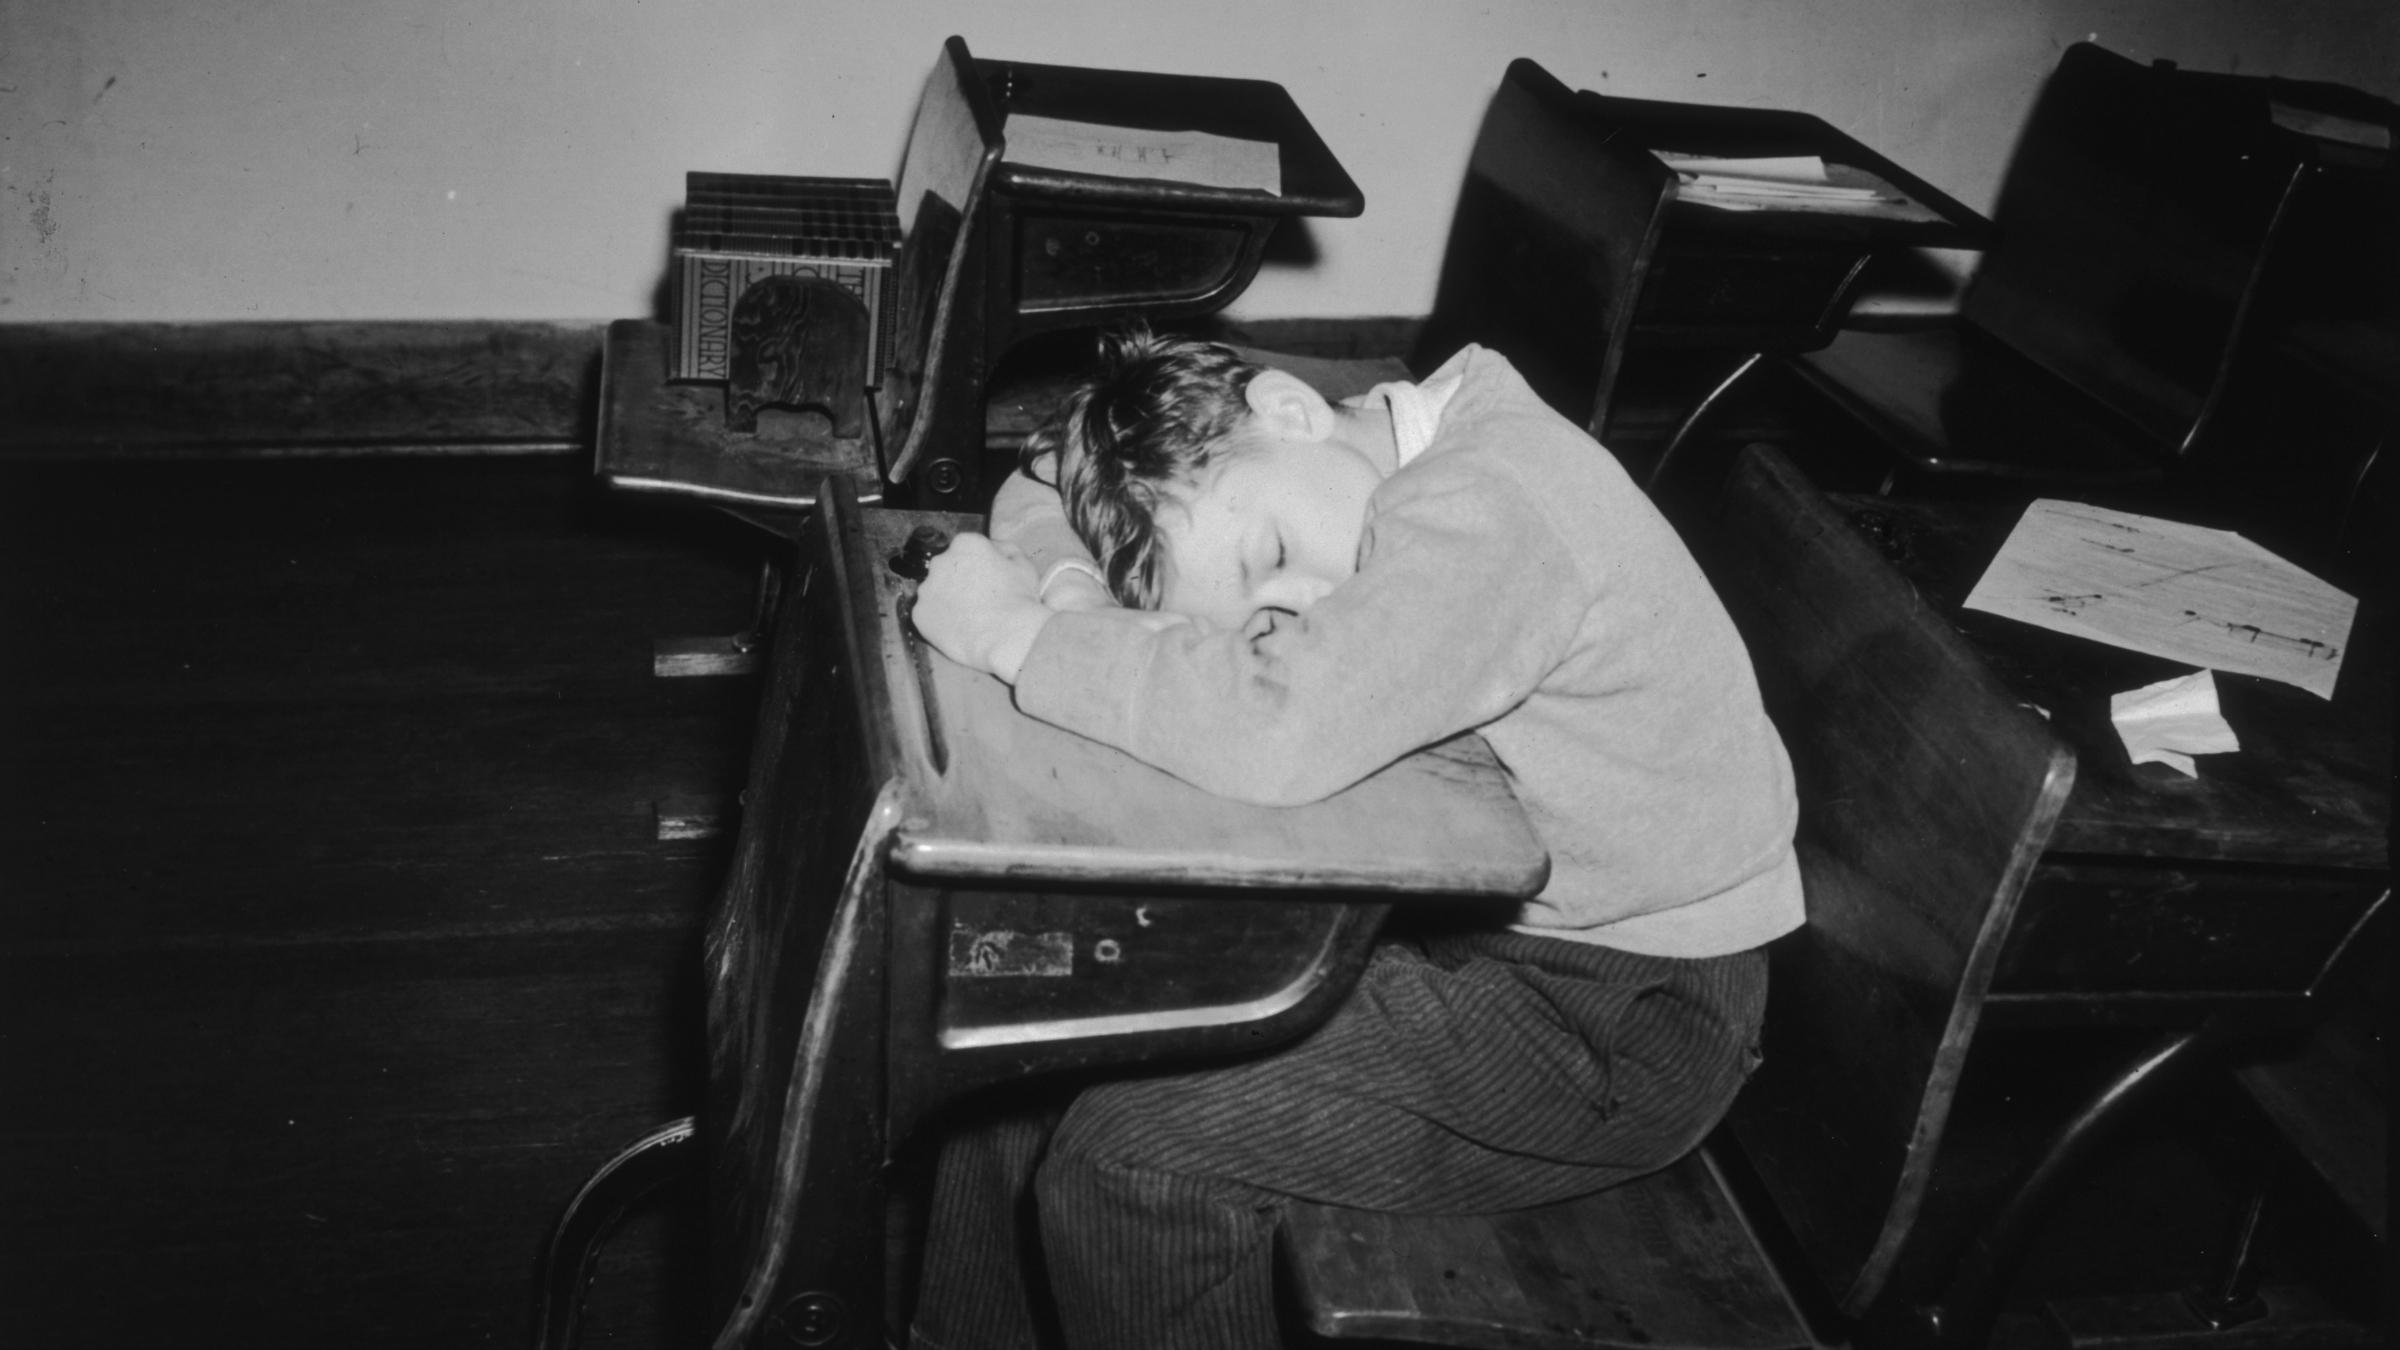 A young boy asleep in class